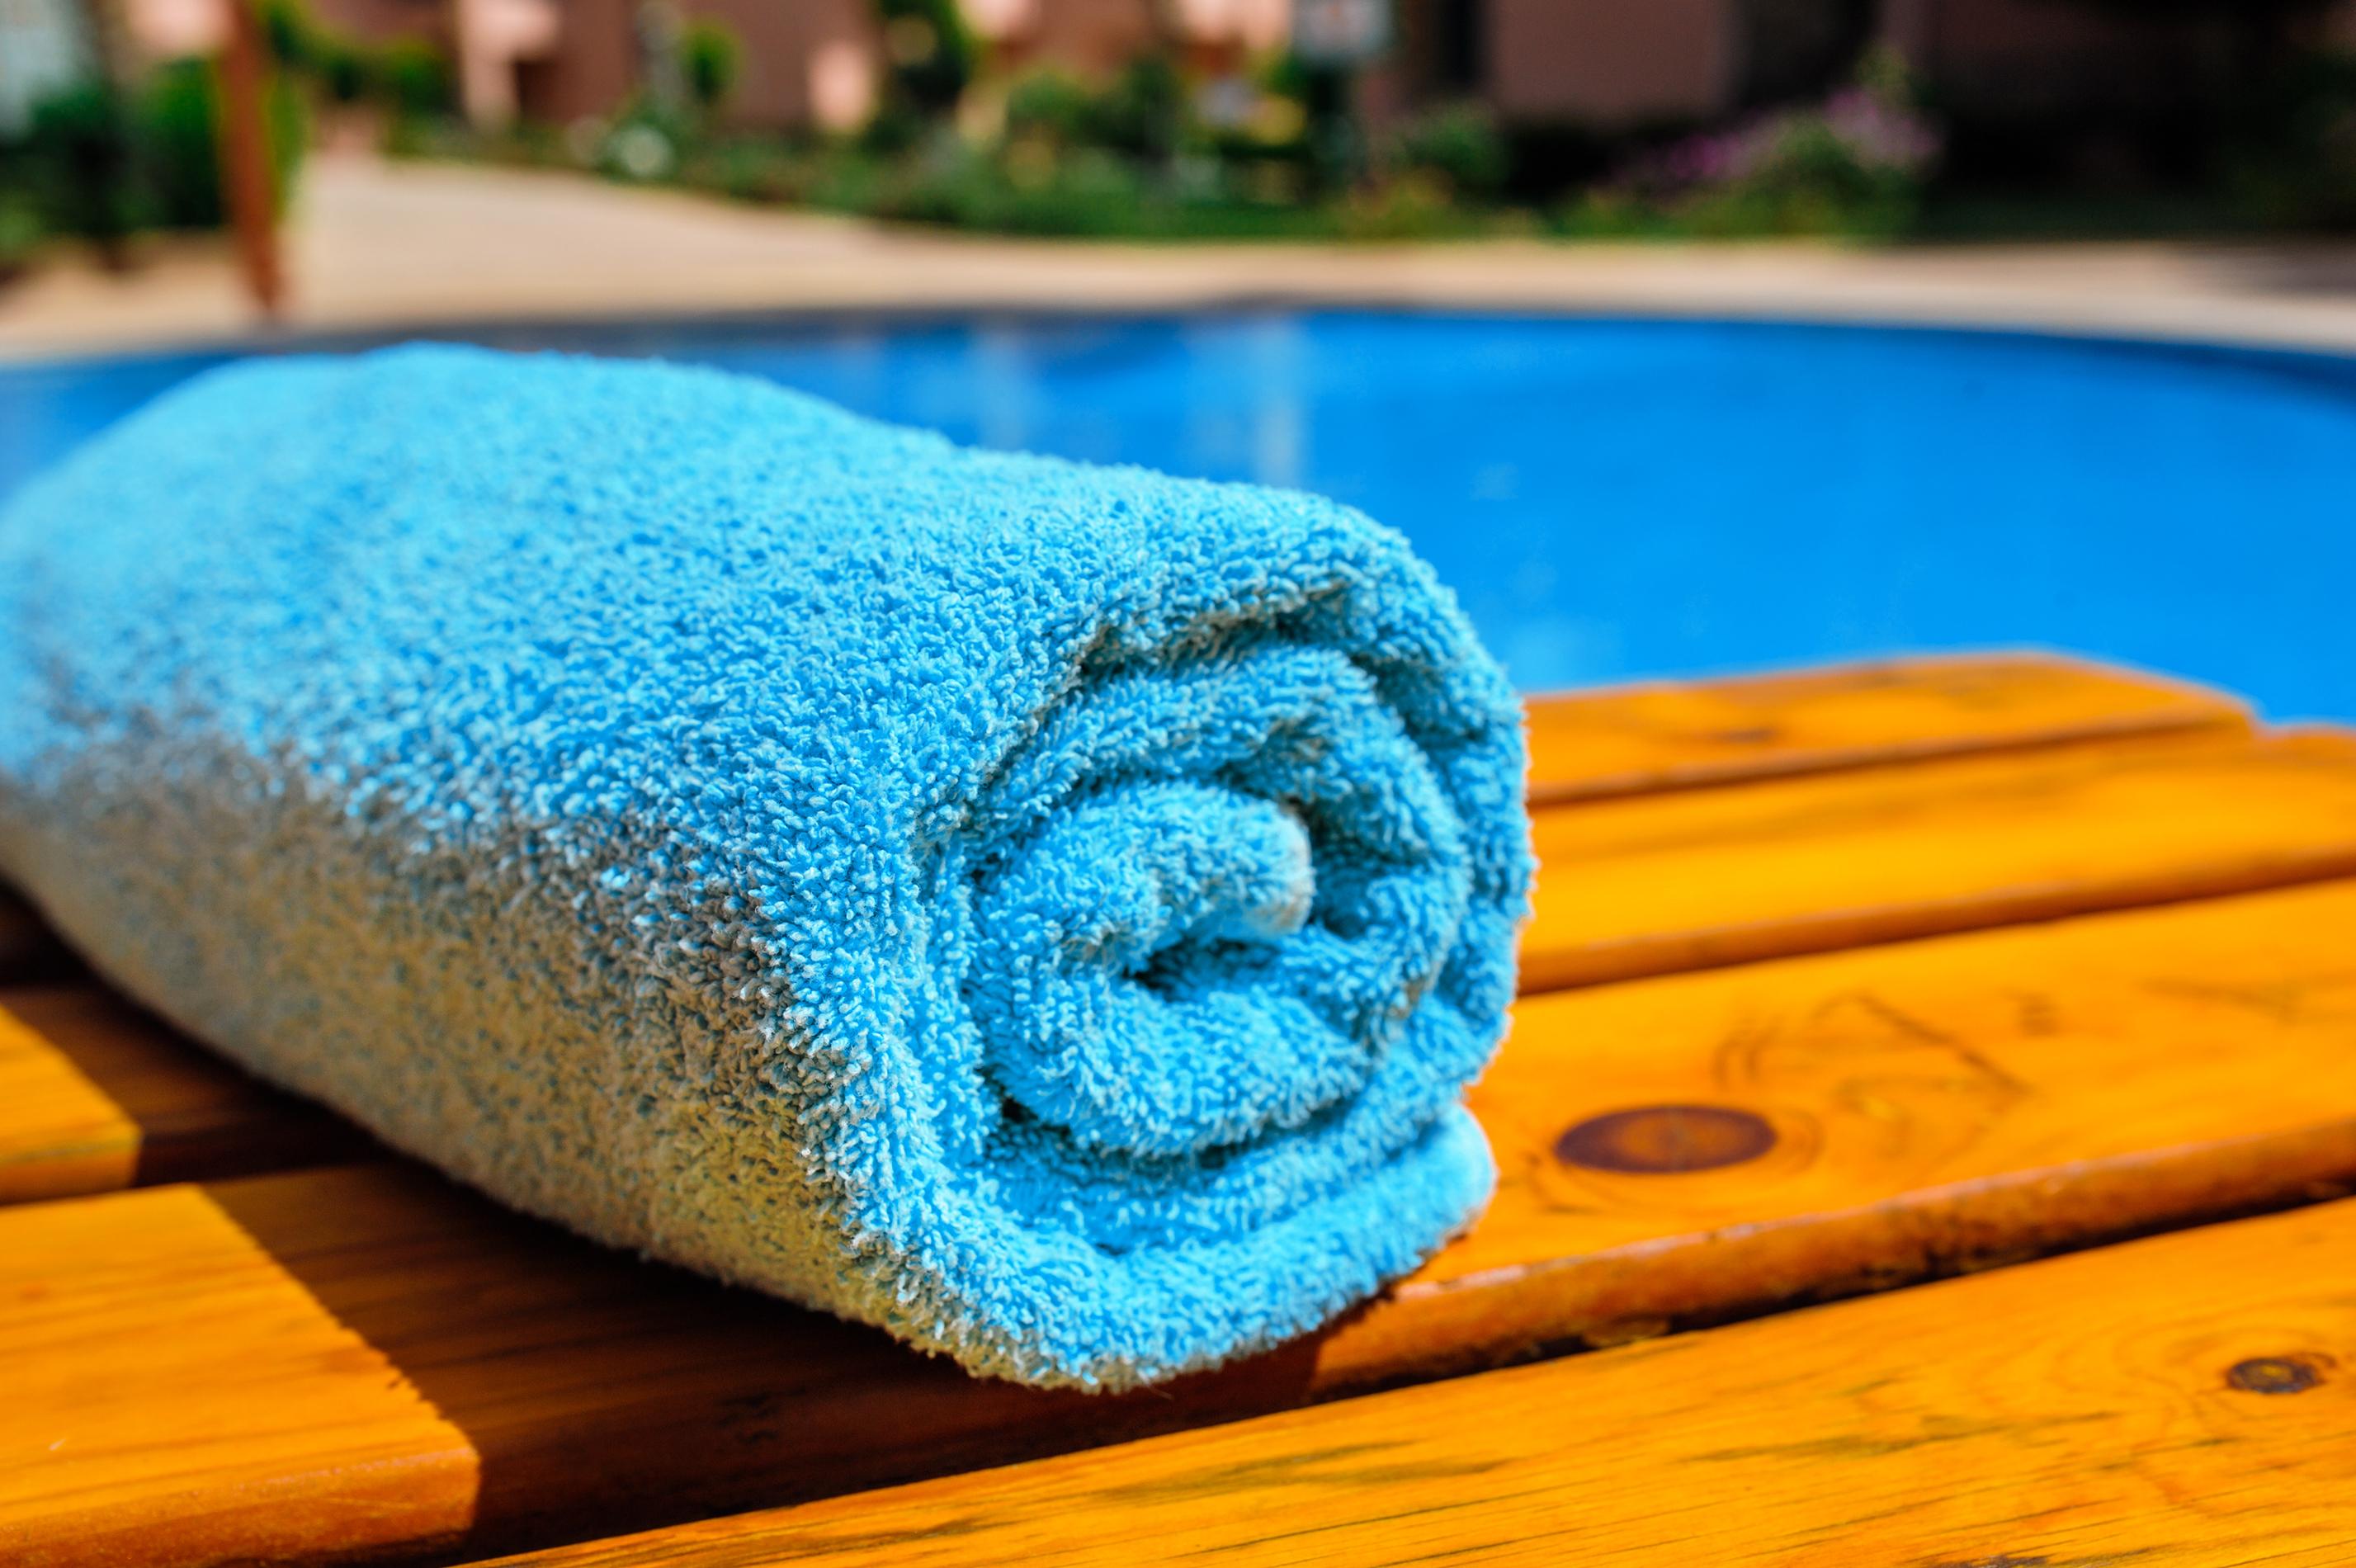 Plain dyed terry cotton towel.